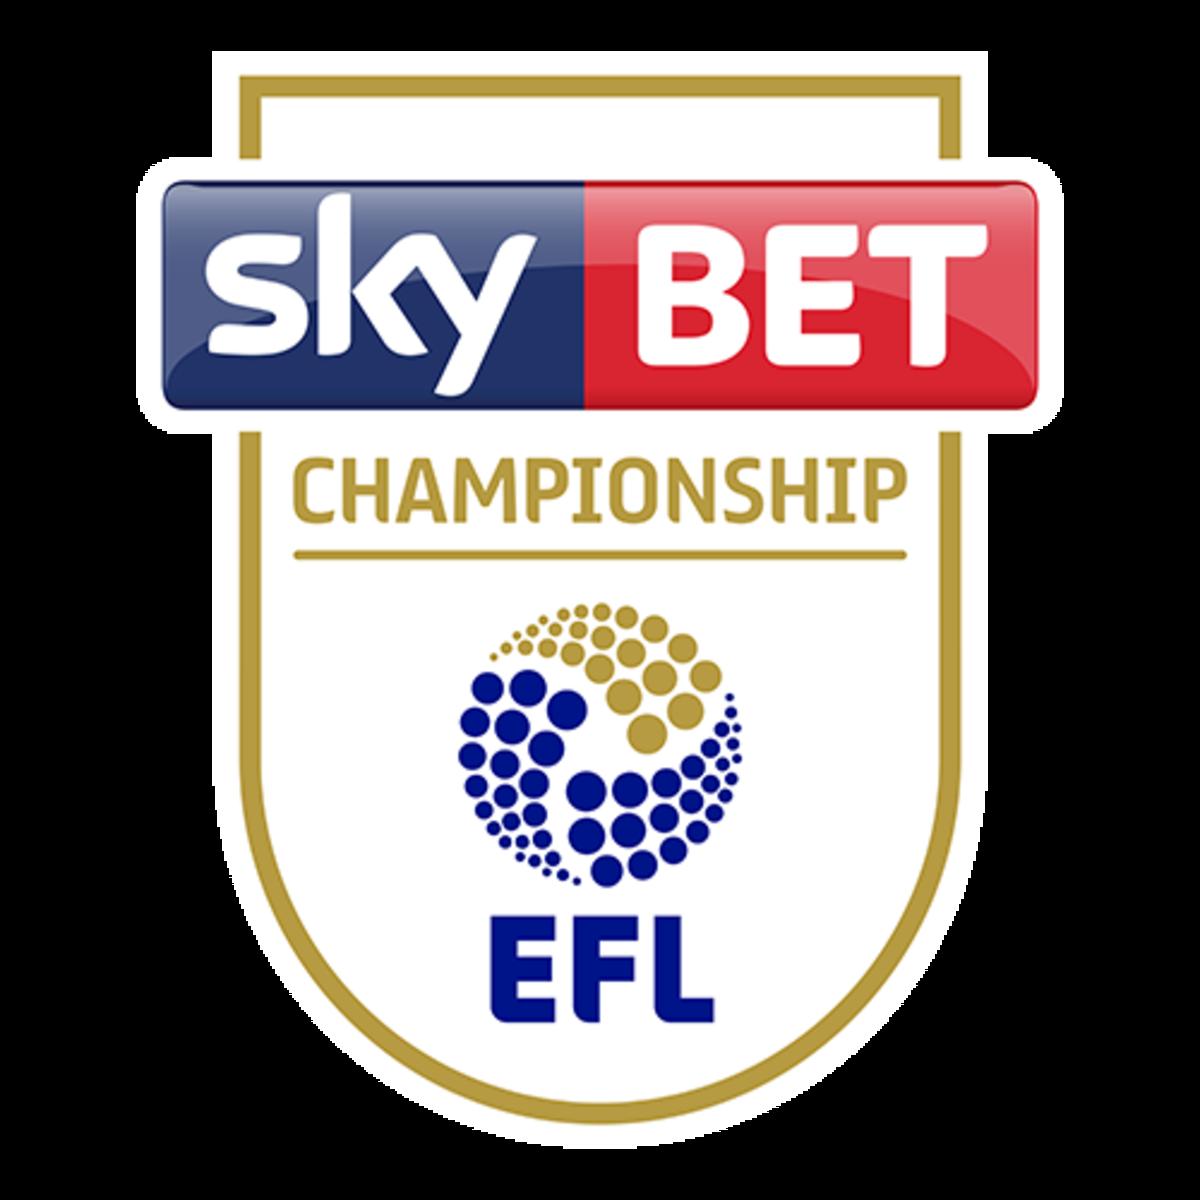 The EFL Championship logo.